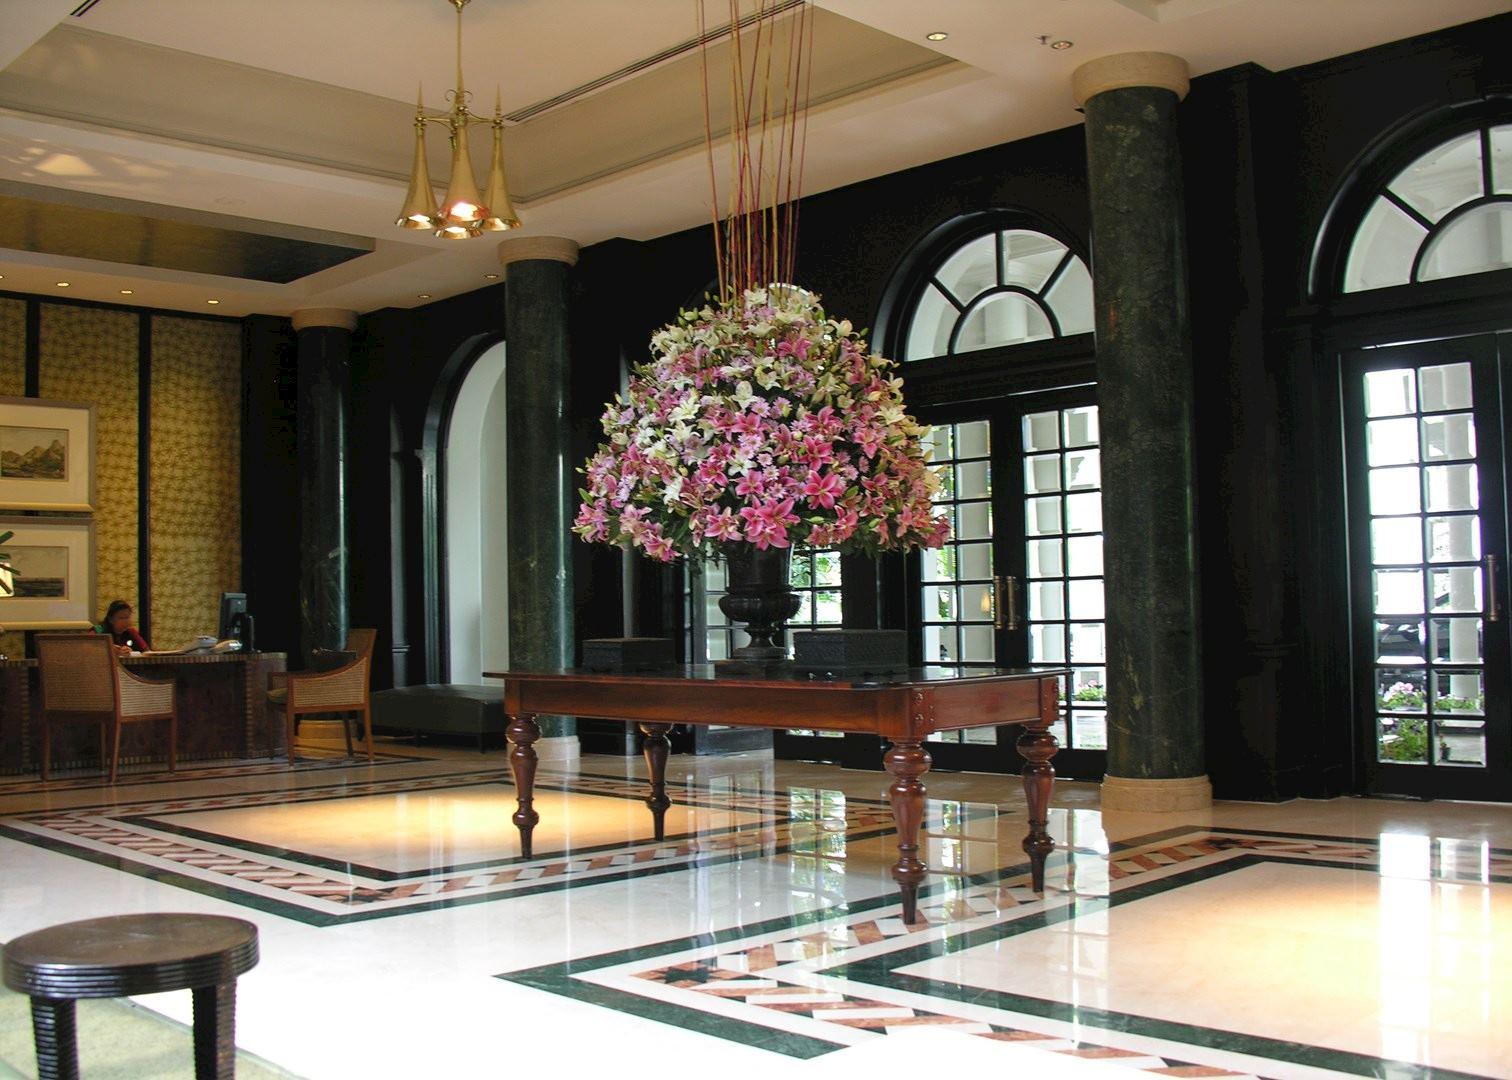 Reception area at Taj West End Hotel  Bangalore. Taj West End   Hotels in Bangalore   Audley Travel